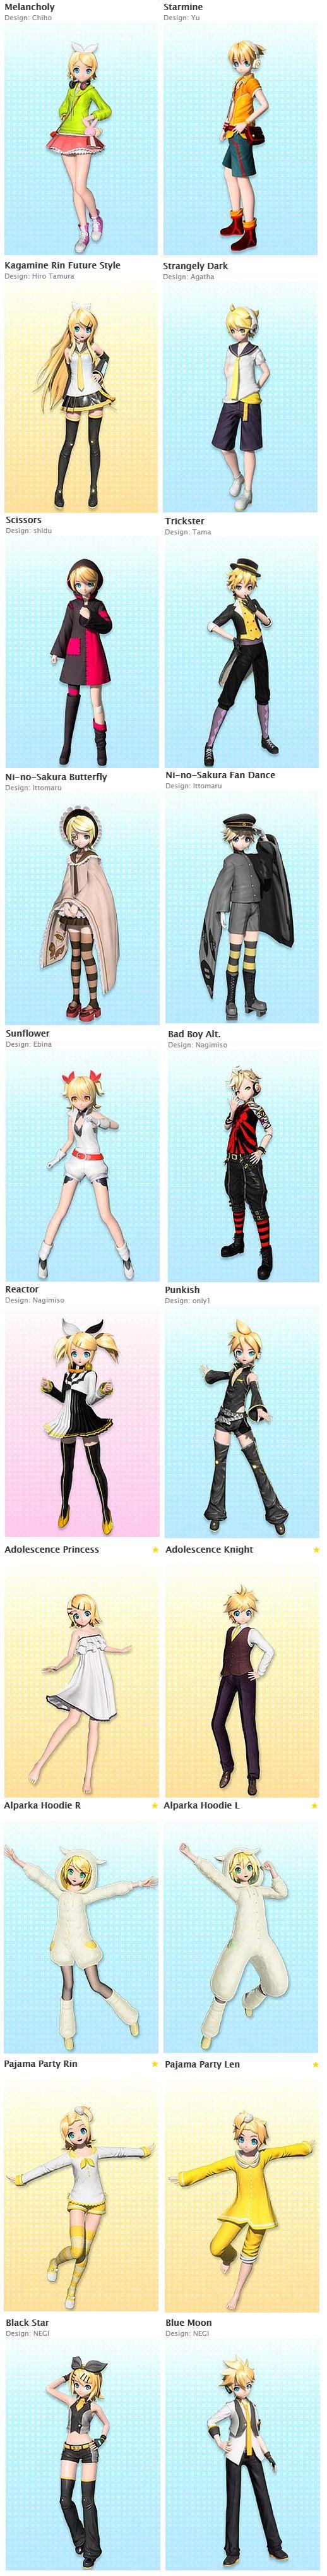 Rin and Len-Module Pairings (2)